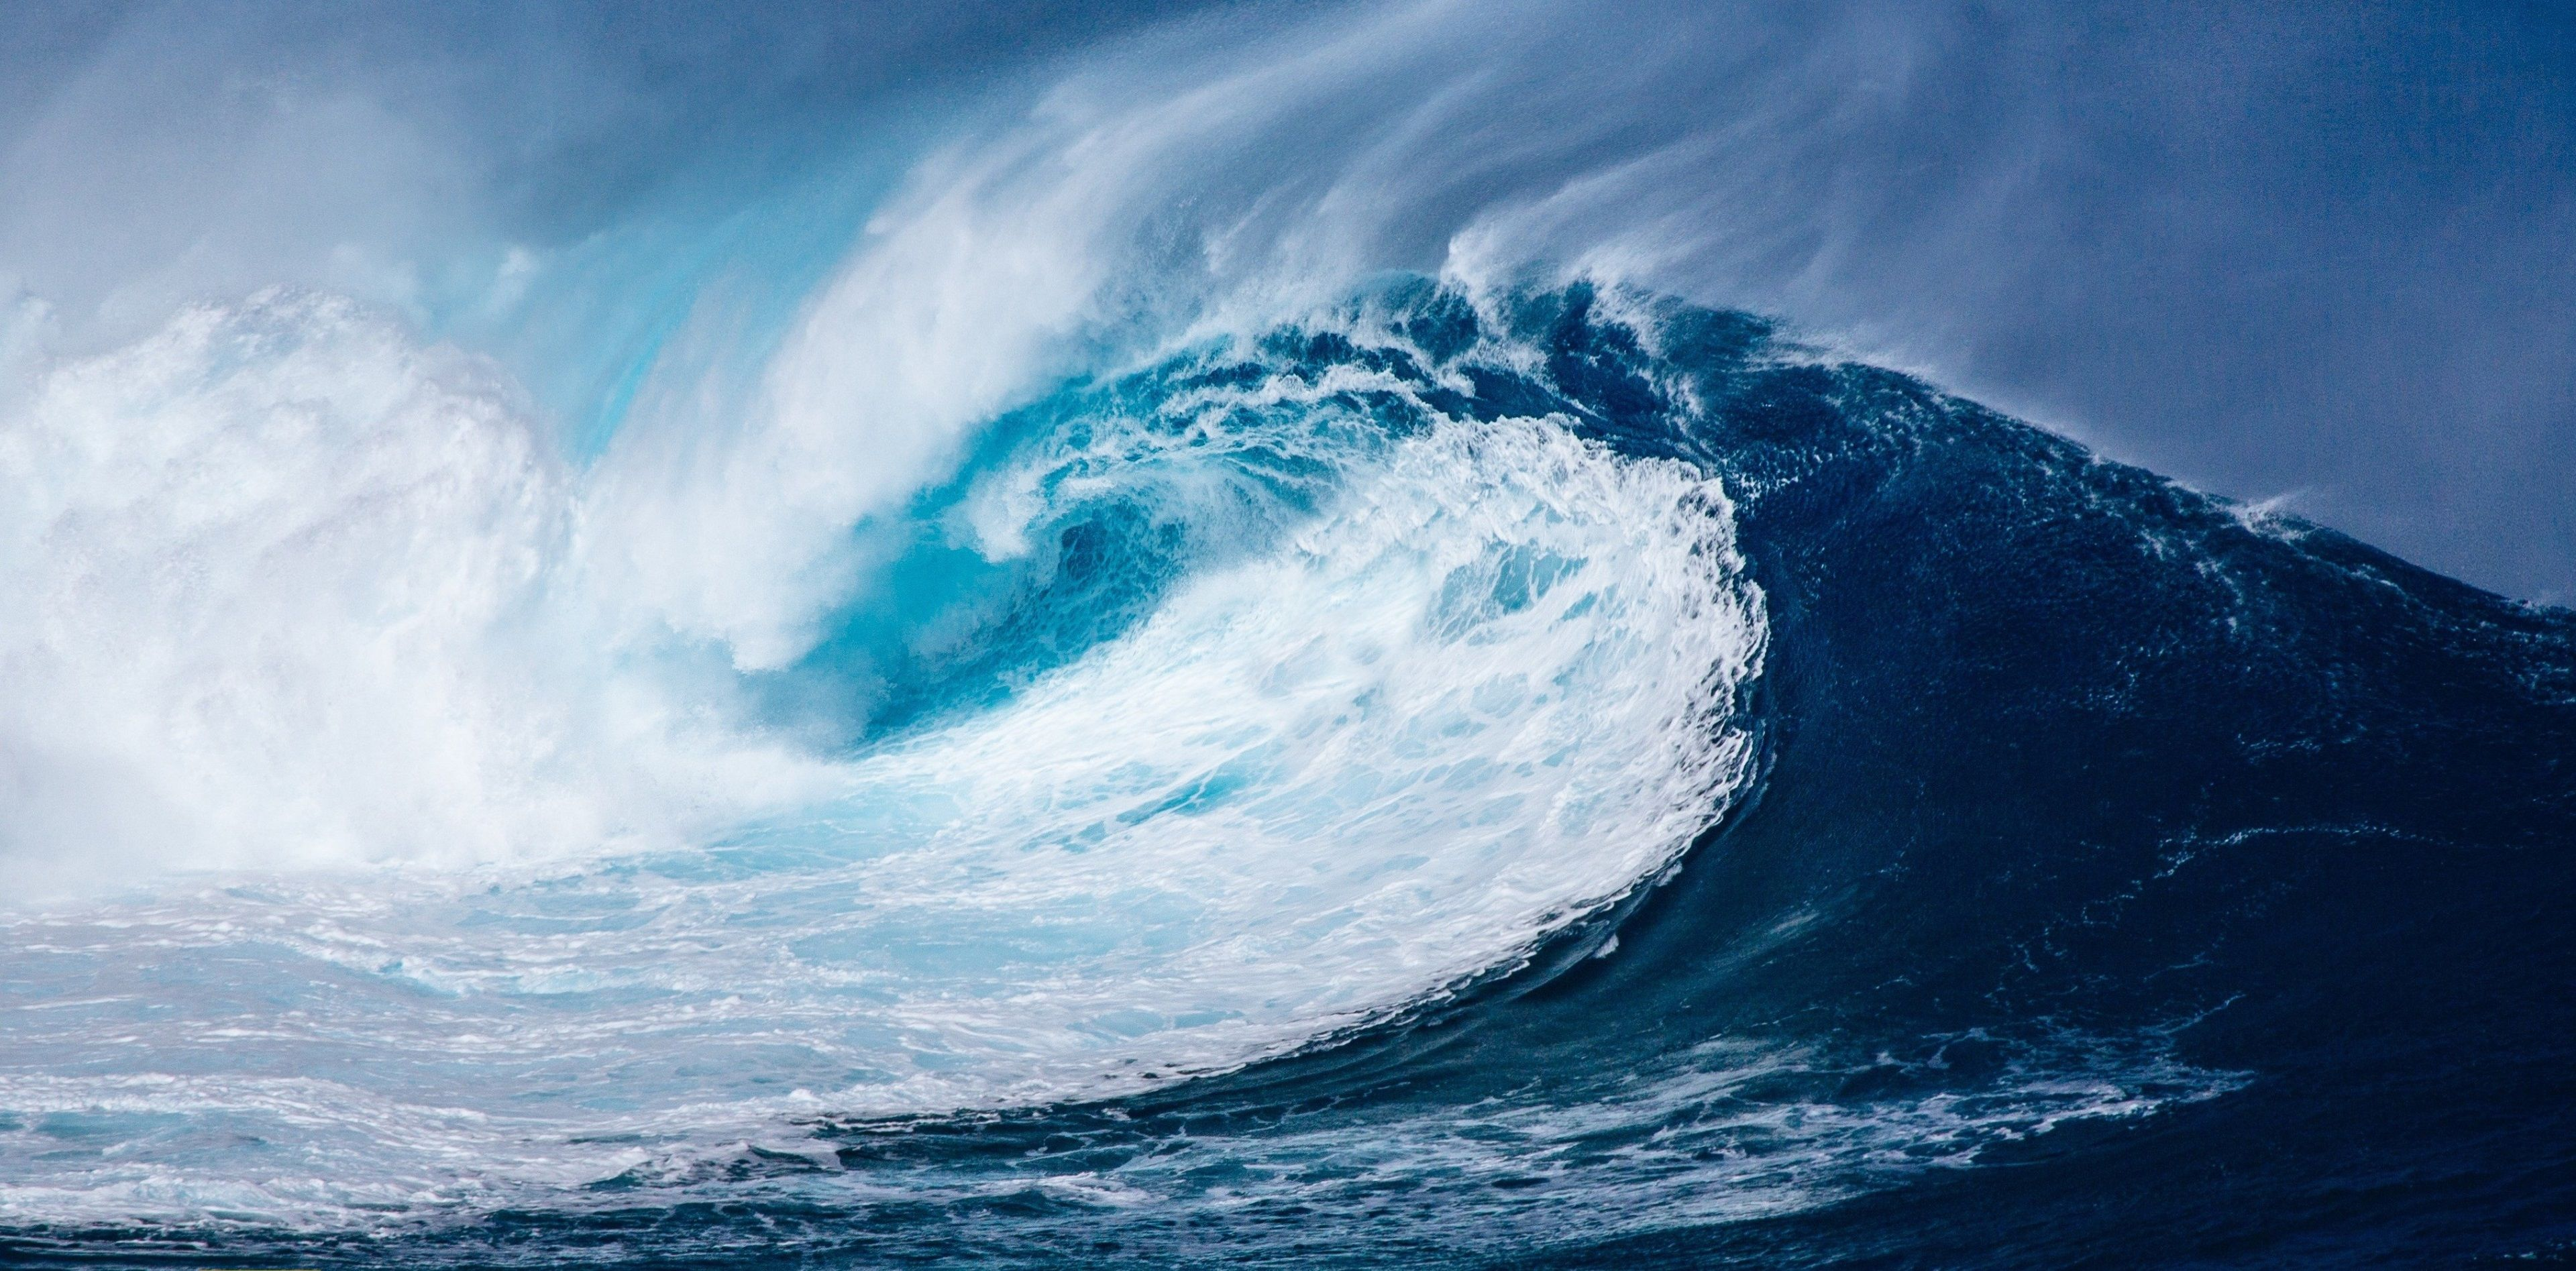 3840x1895 tidal waves 4k desktop wallpaper for computer